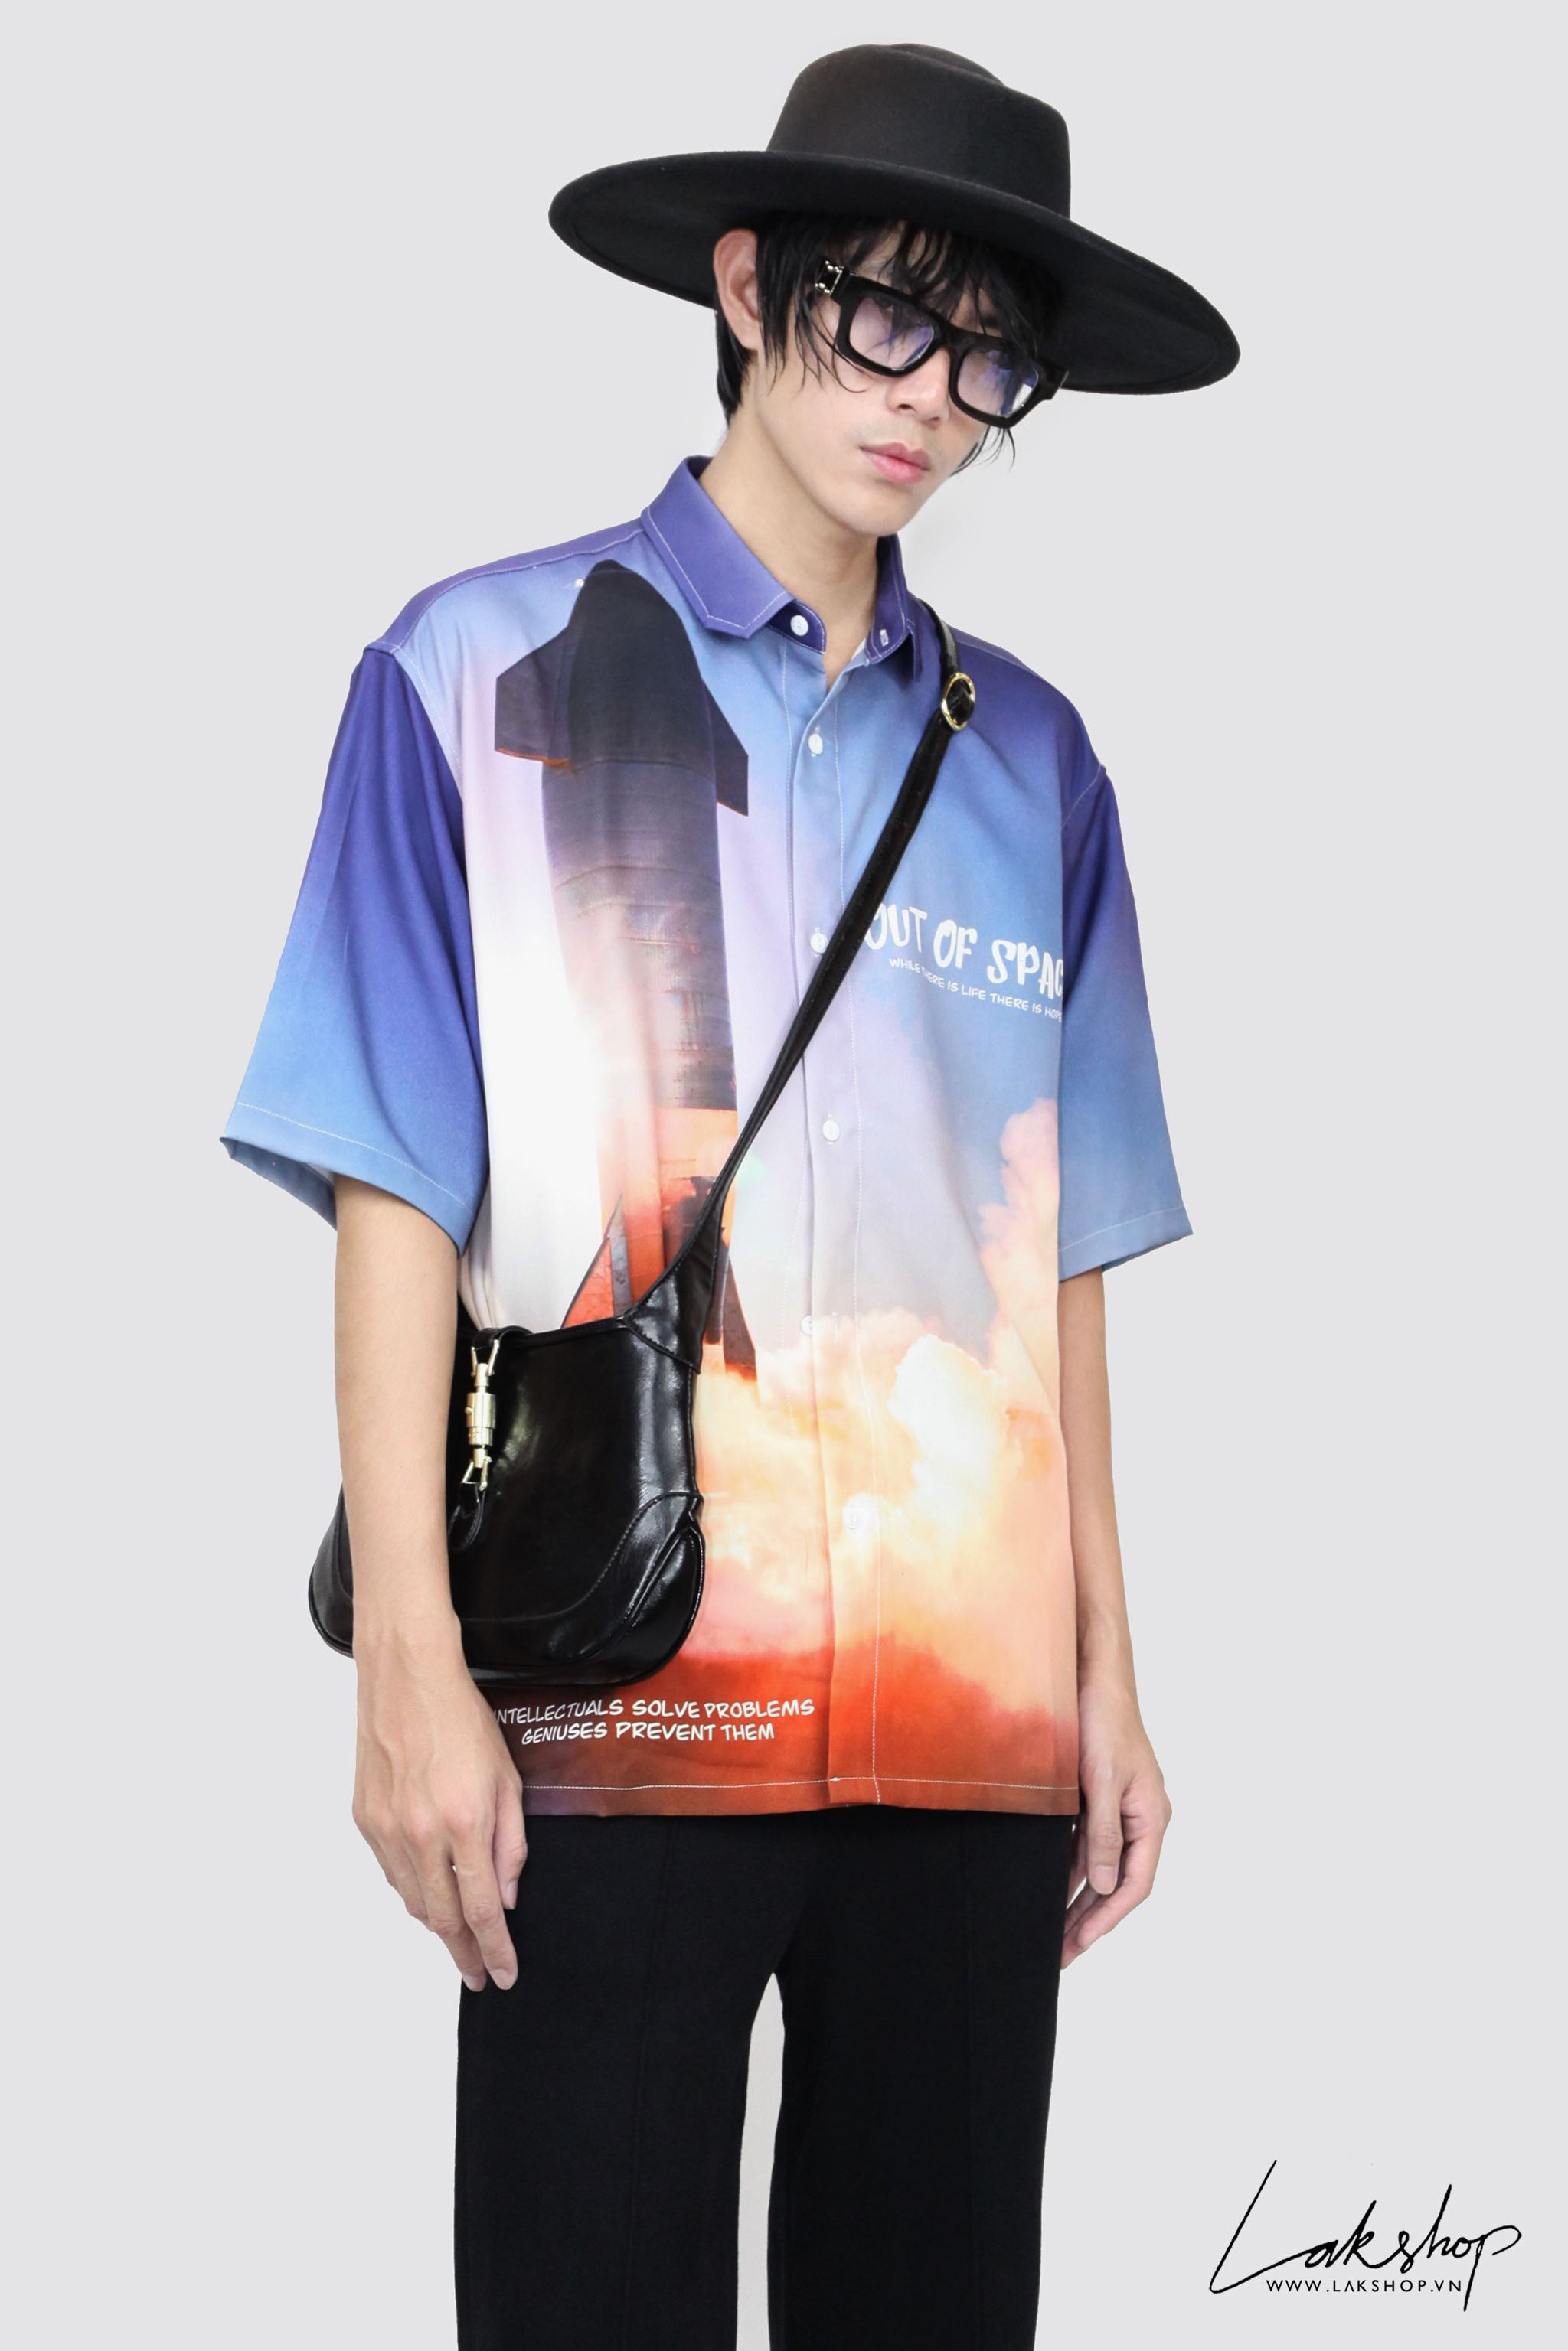 Oversized Out Of Space Rocket Print Short Sleeve Shirt cv3